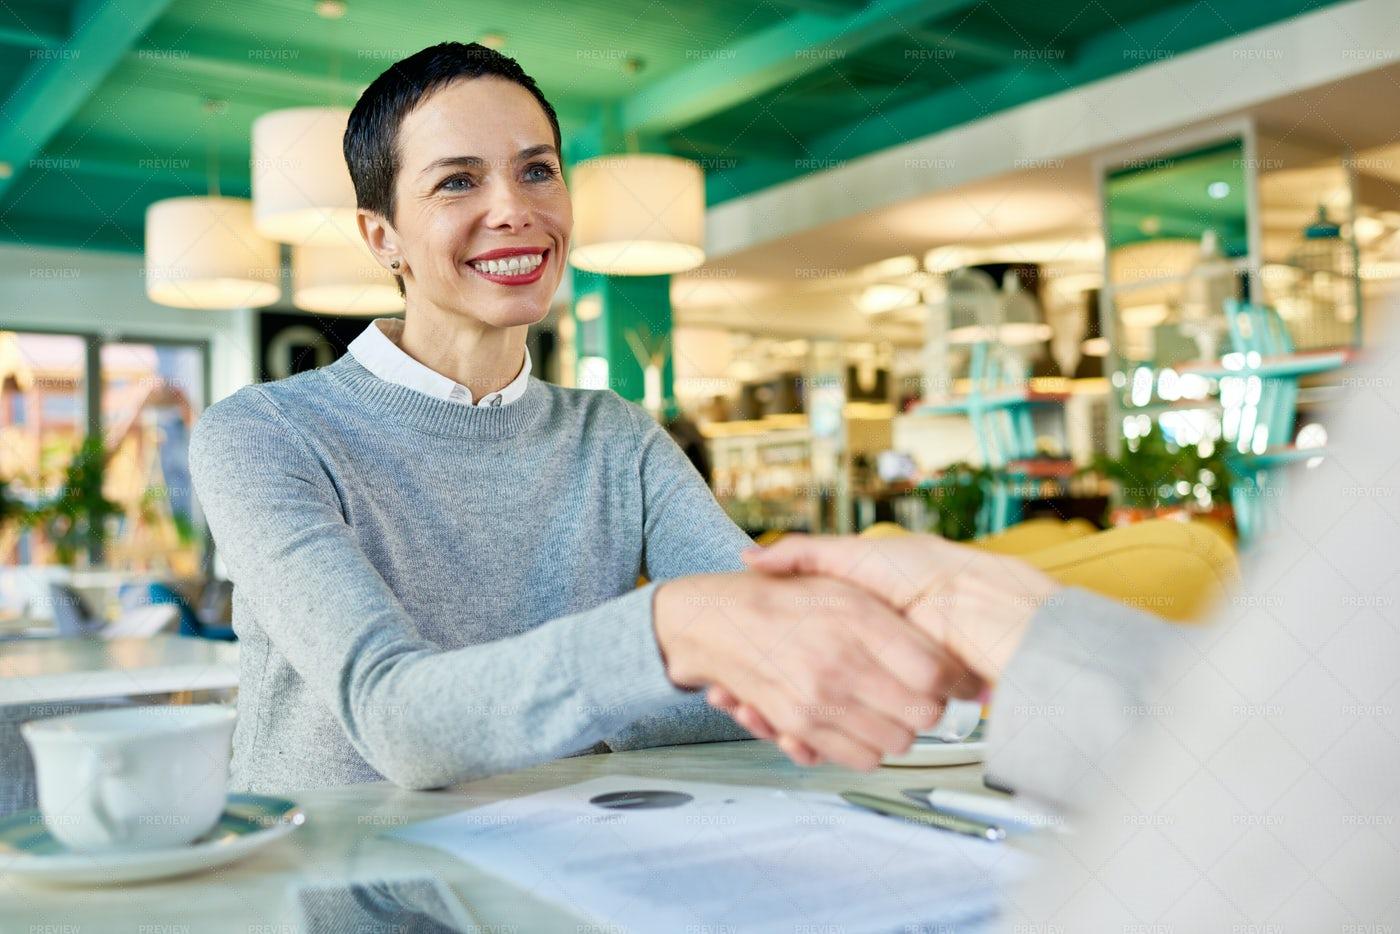 Businesswomen Shaking Hands In Cafe...: Stock Photos